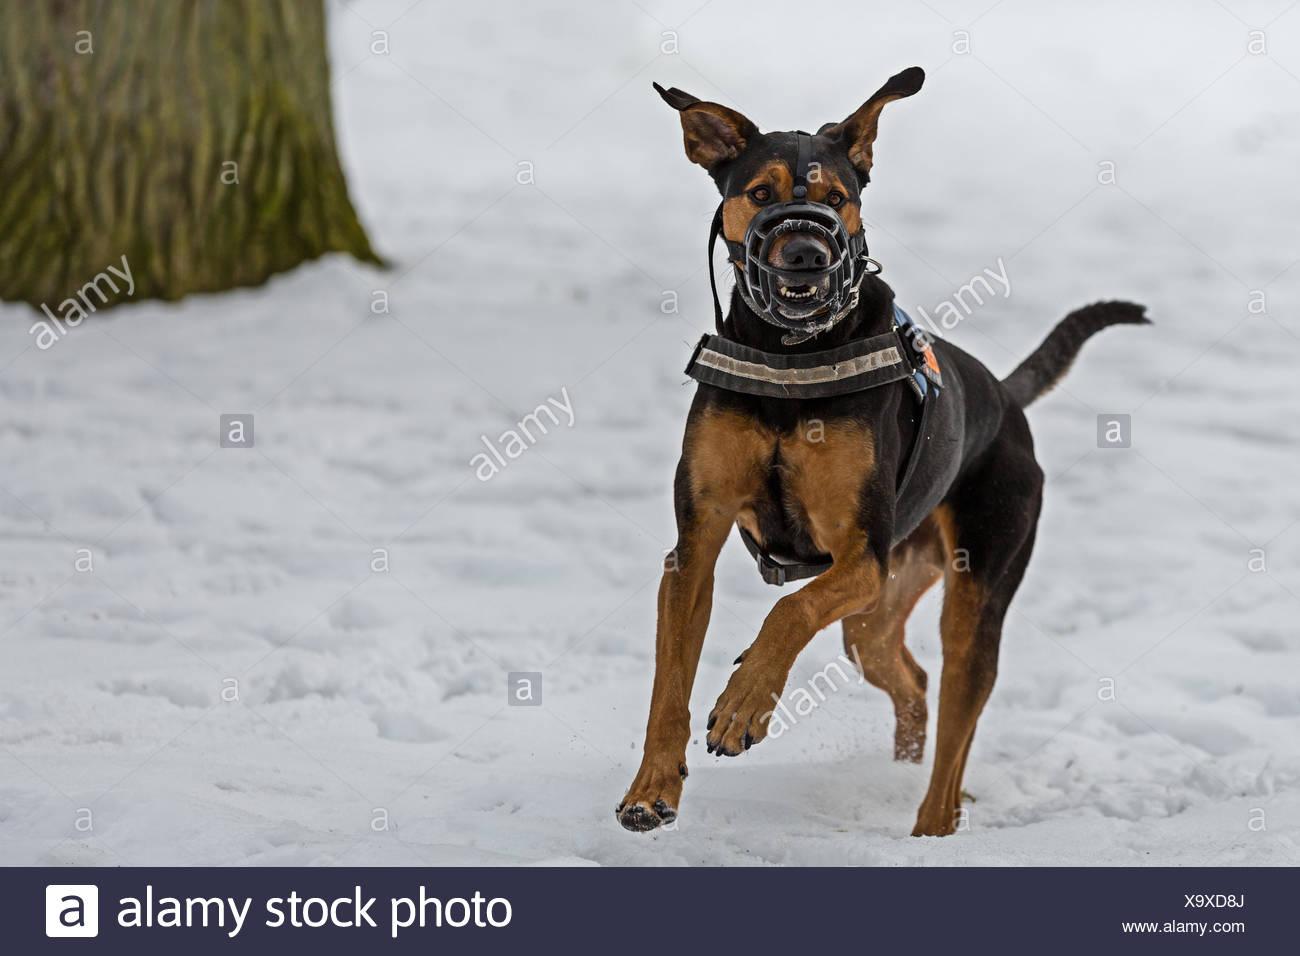 Doberman with muzzle - Stock Image